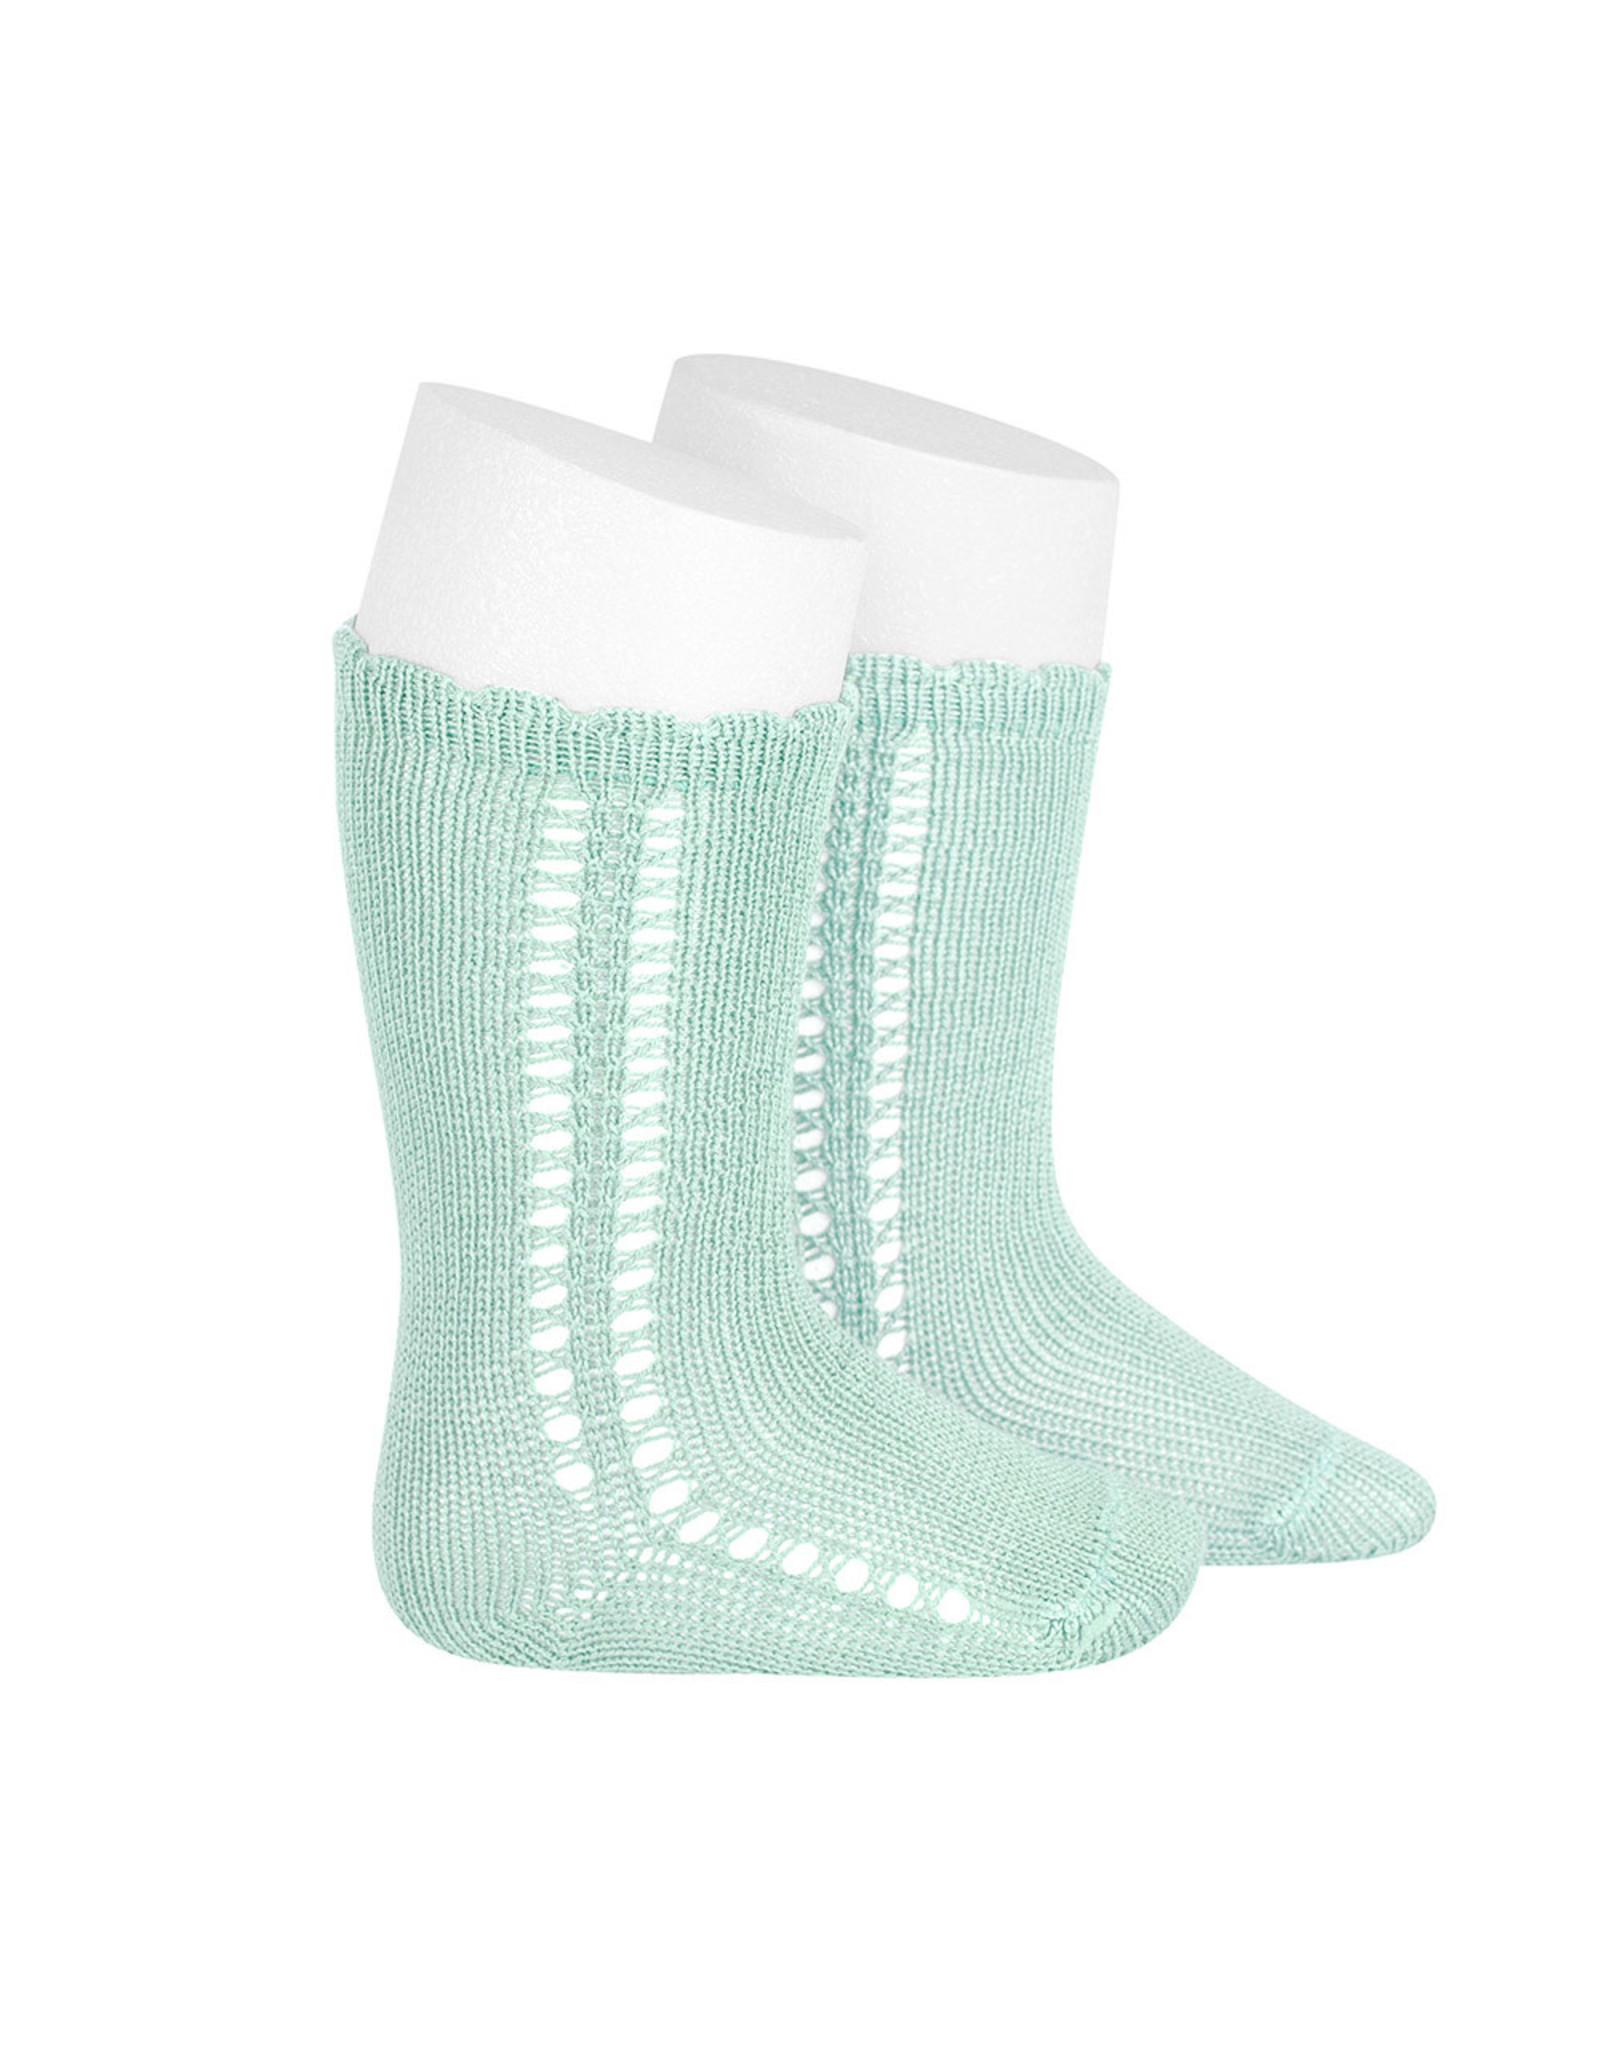 CONDOR Pastel Green Side Openwork Knee Socks